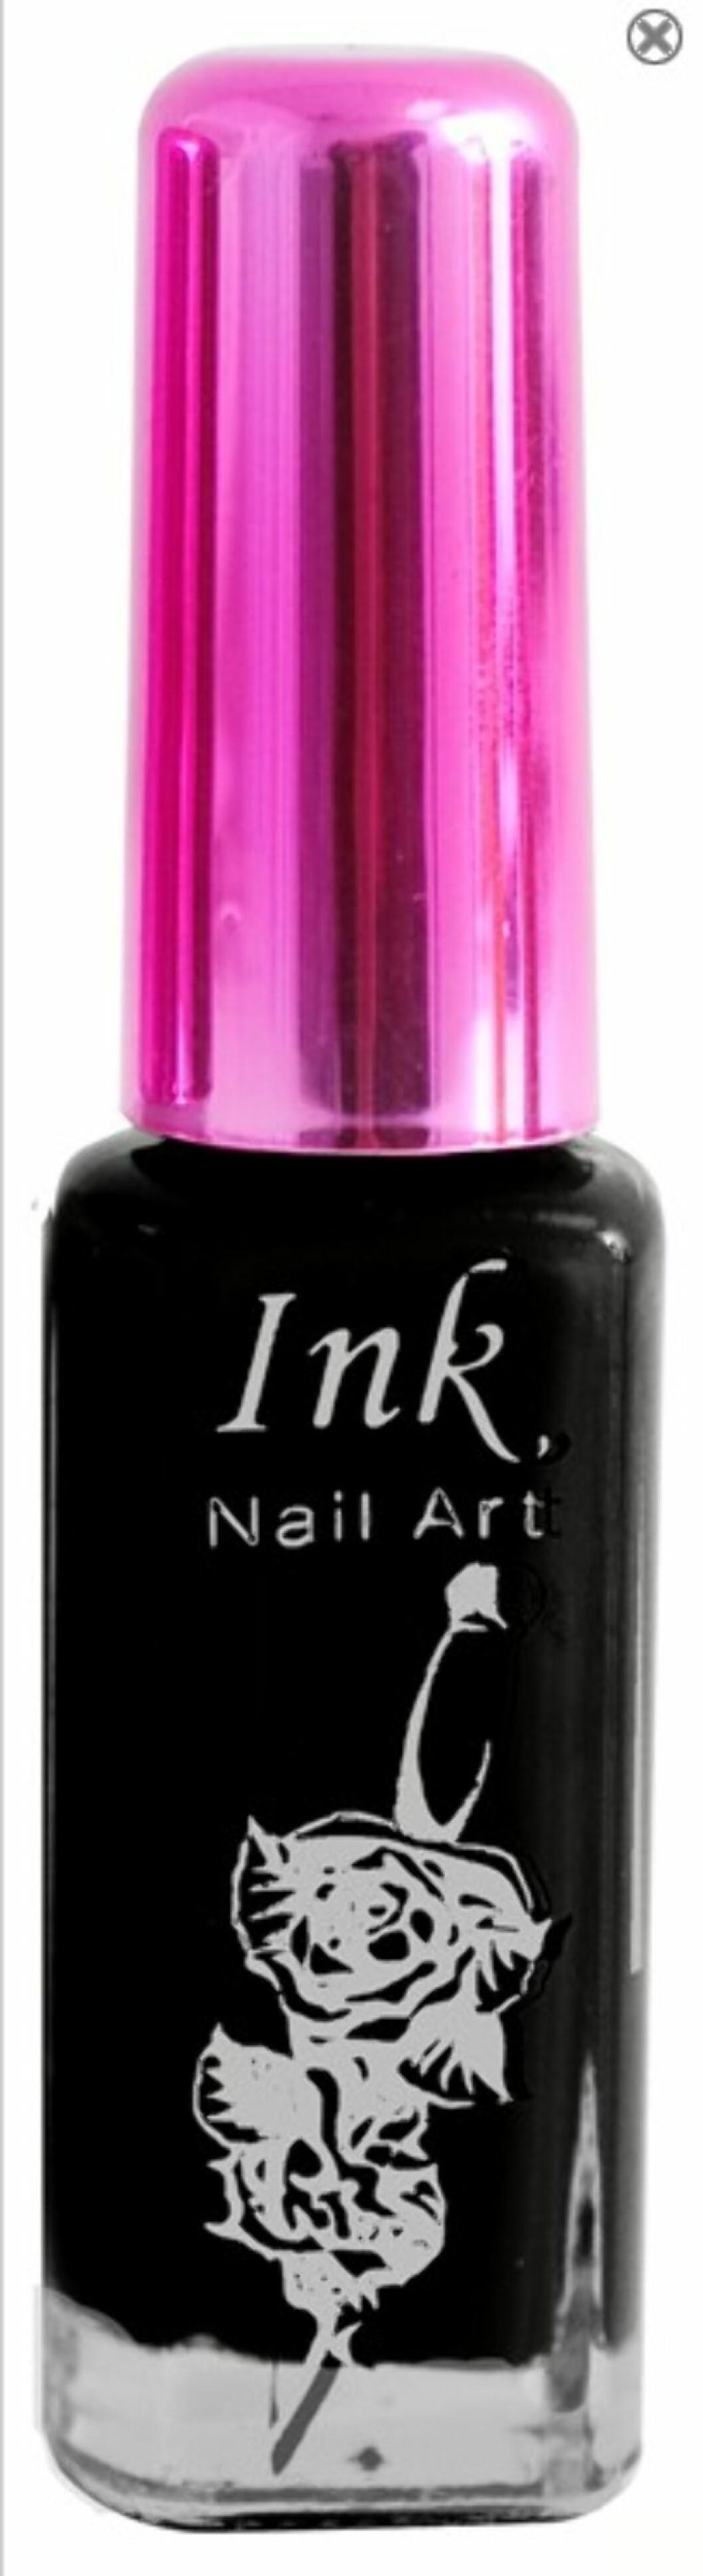 Svart fra Ink (kr.89/Blush.no). Foto: Produsenten